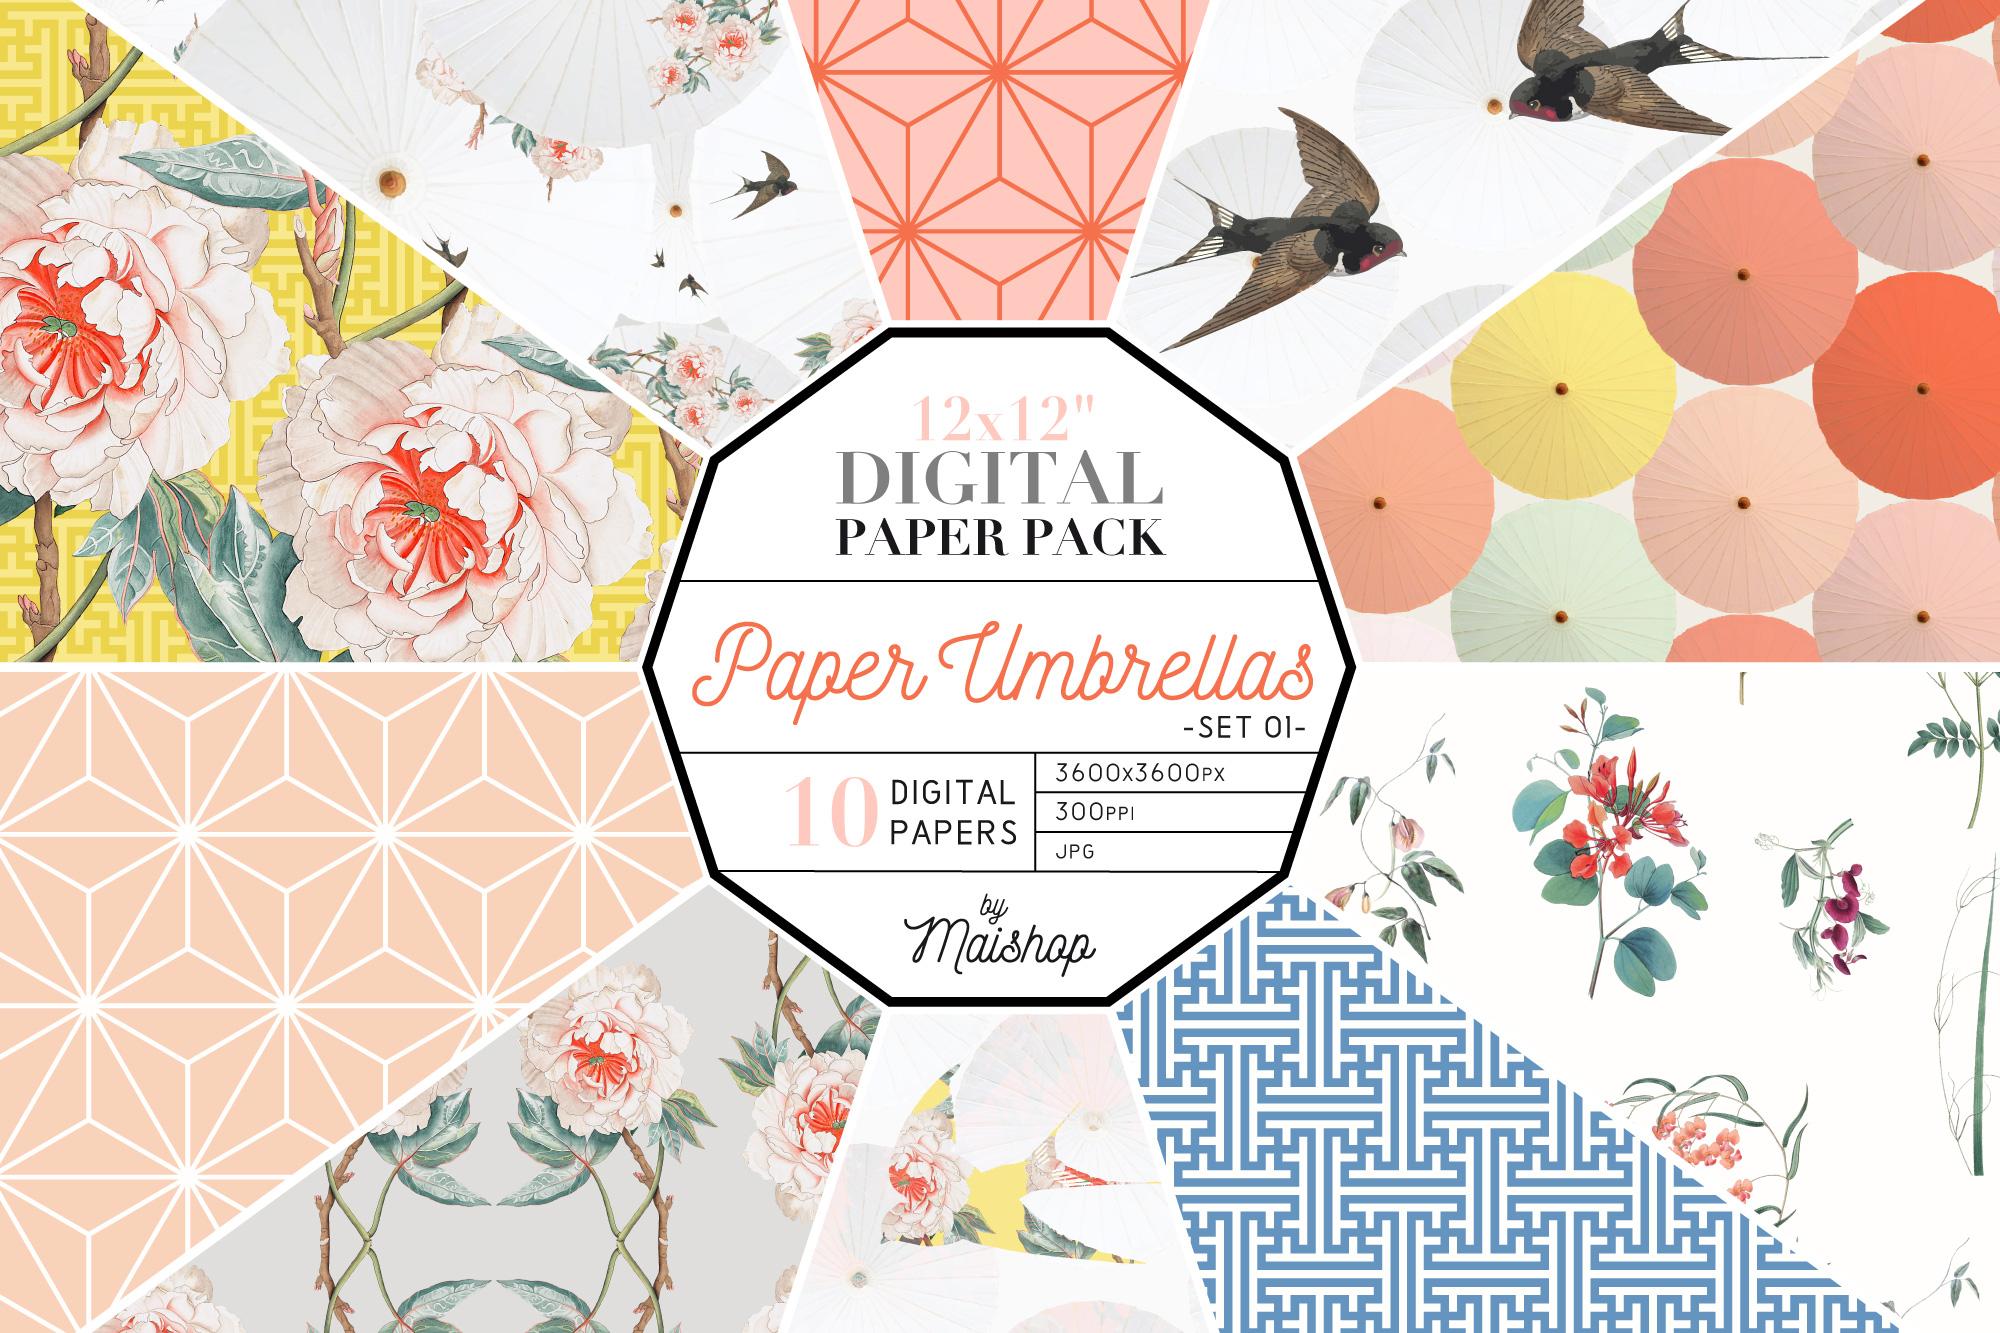 Digital Paper Pack